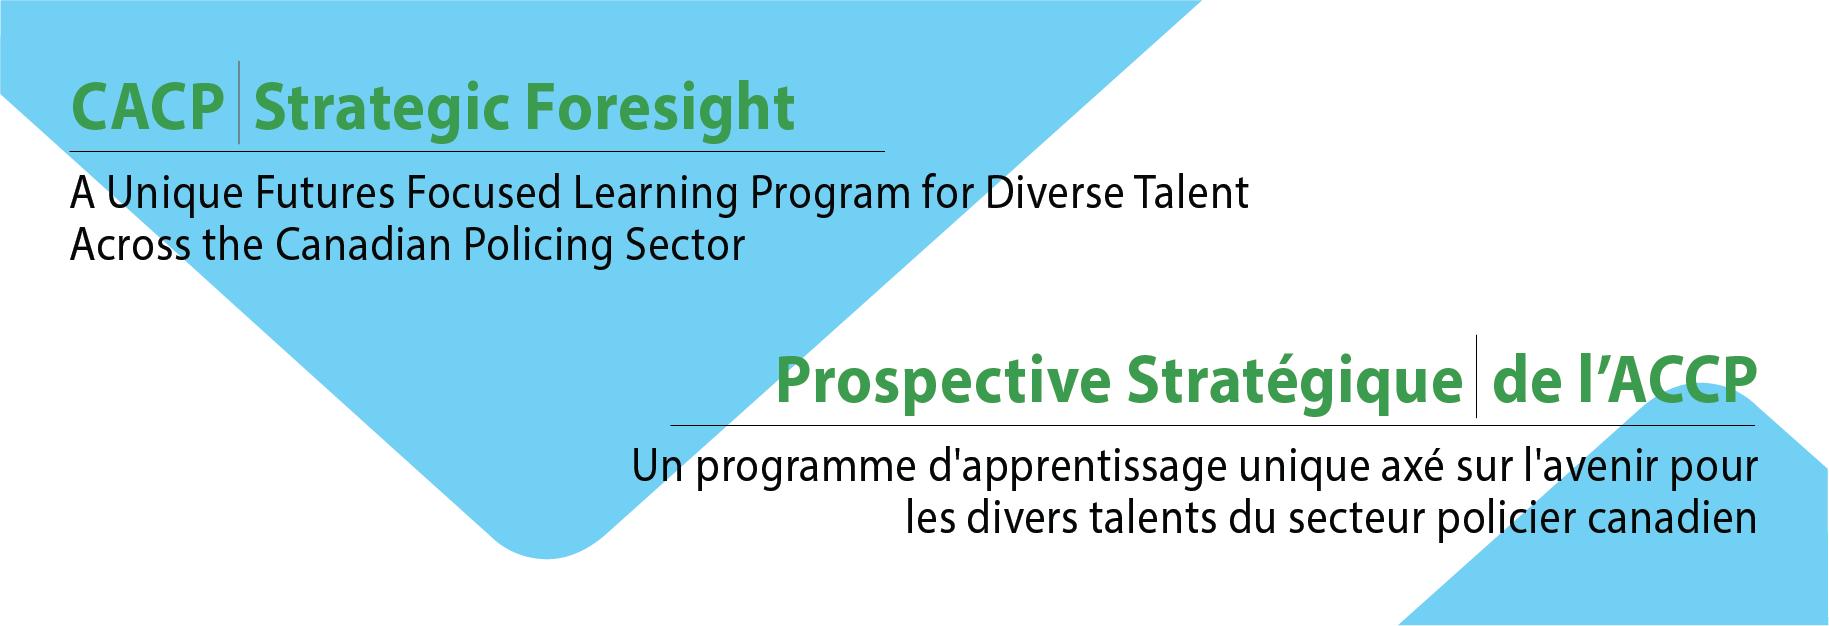 CACP Strategic Foresight Program